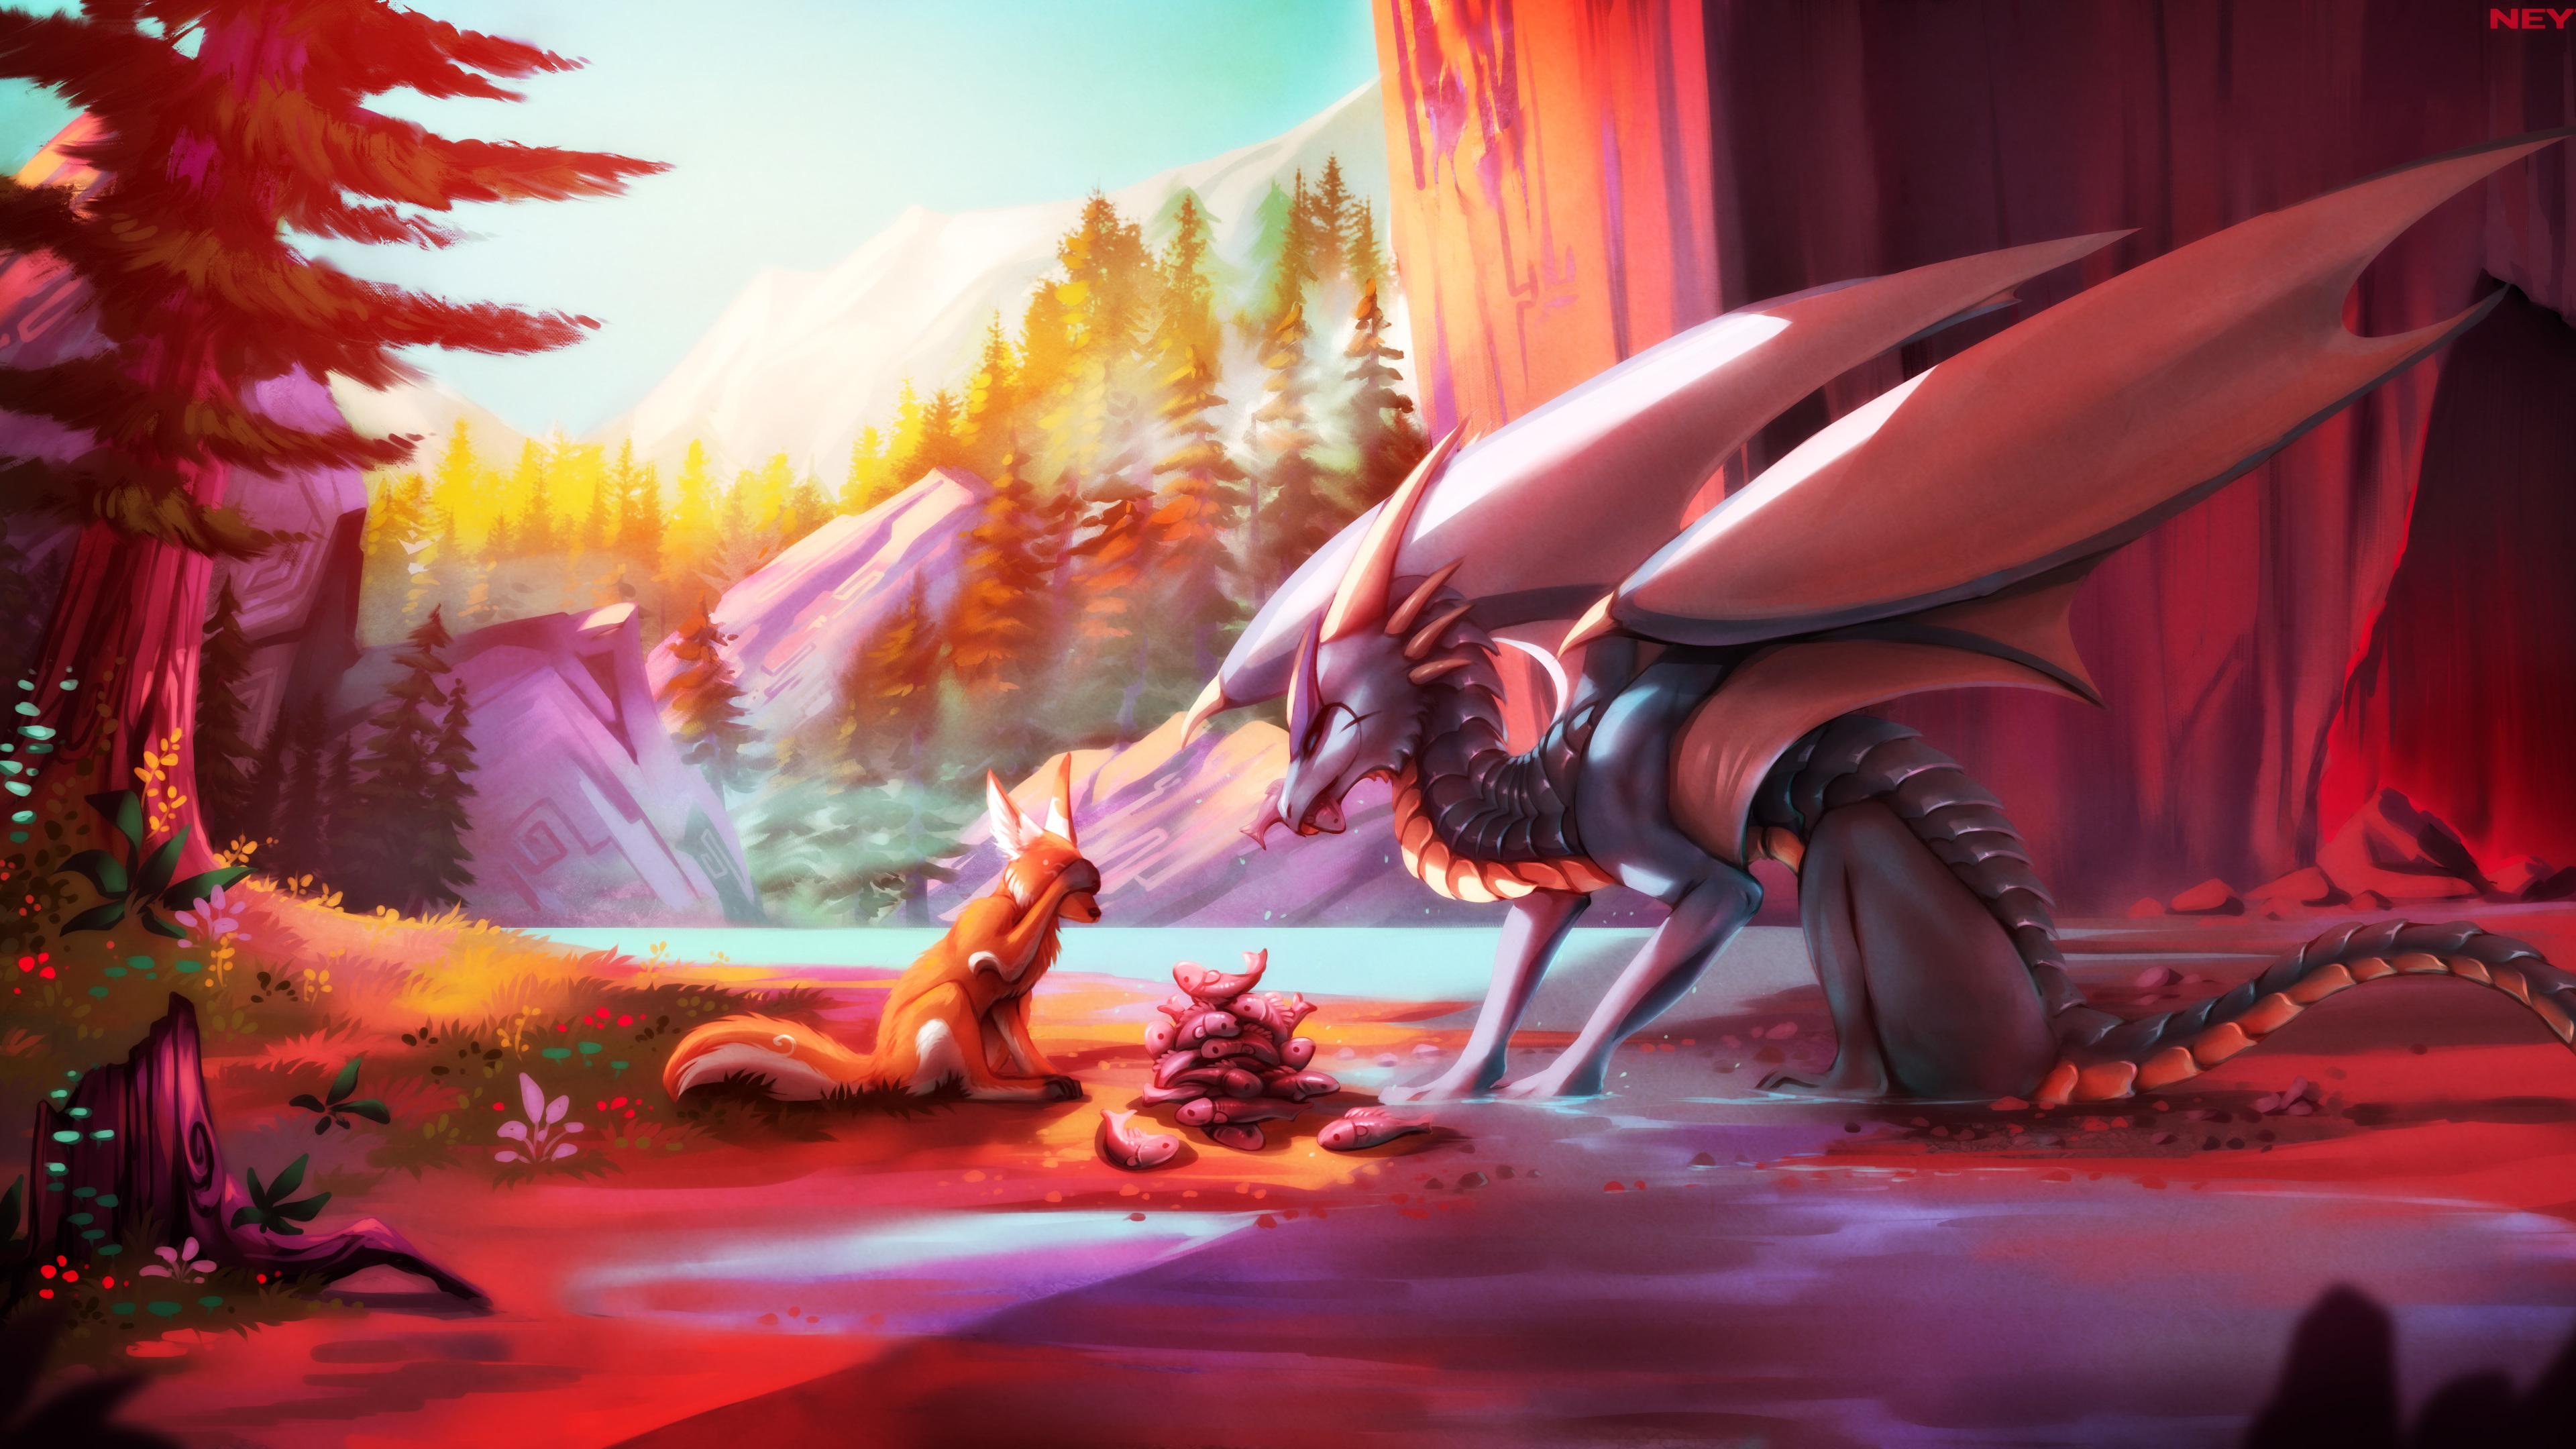 dragon wolf drawings painting fantasy 4k 1540751391 - Dragon Wolf Drawings Painting Fantasy 4k - wolf wallpapers, painting wallpapers, hd-wallpapers, fantasy wallpapers, drawing wallpapers, dragon wallpapers, digital art wallpapers, deviantart wallpapers, artwork wallpapers, artist wallpapers, 4k-wallpapers